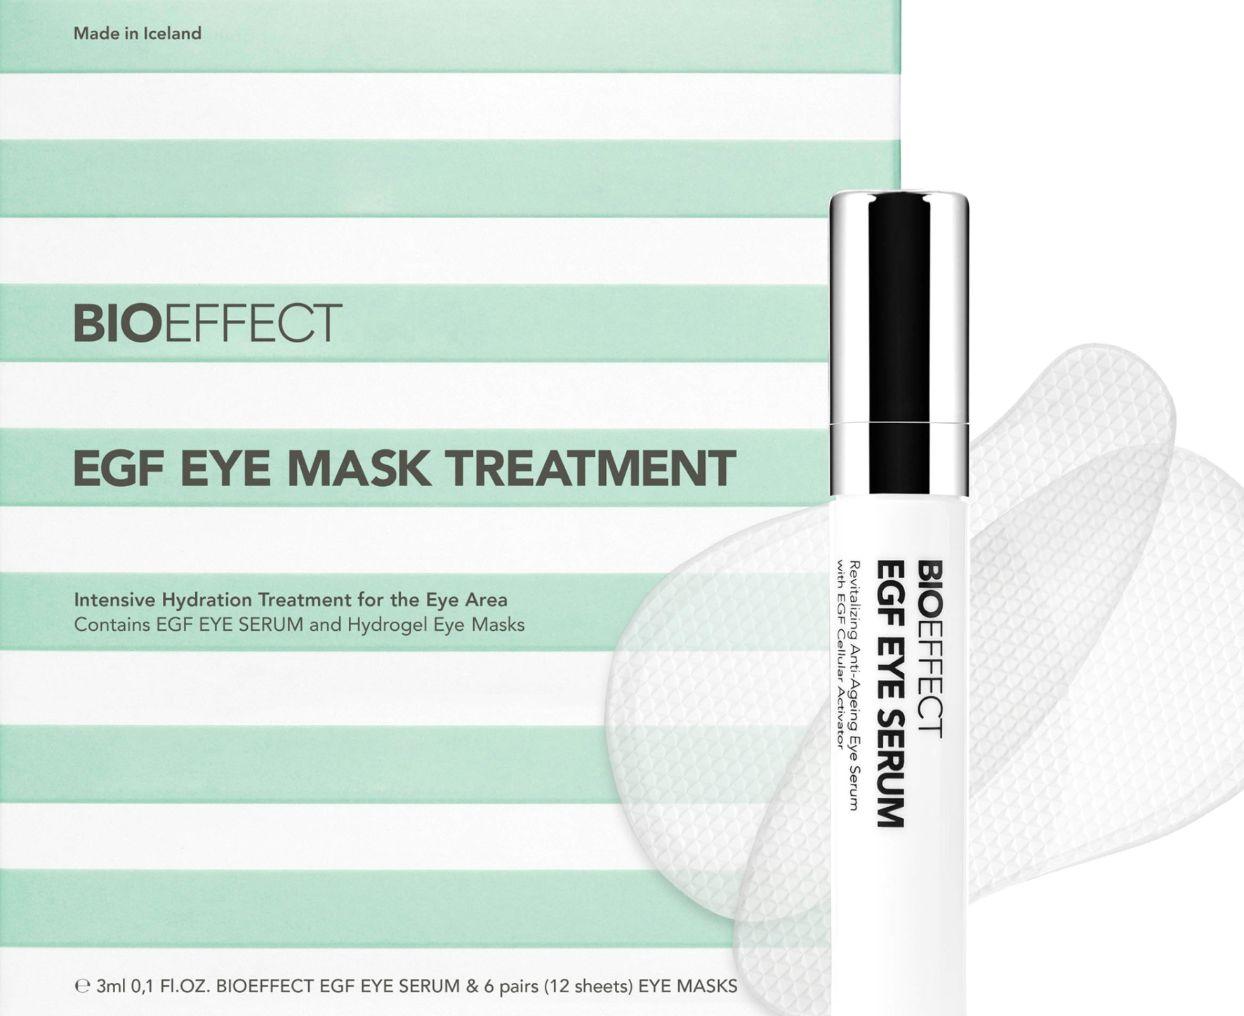 øjenmaske Bioeffect EGF Eye Mask Treatment 3 ml